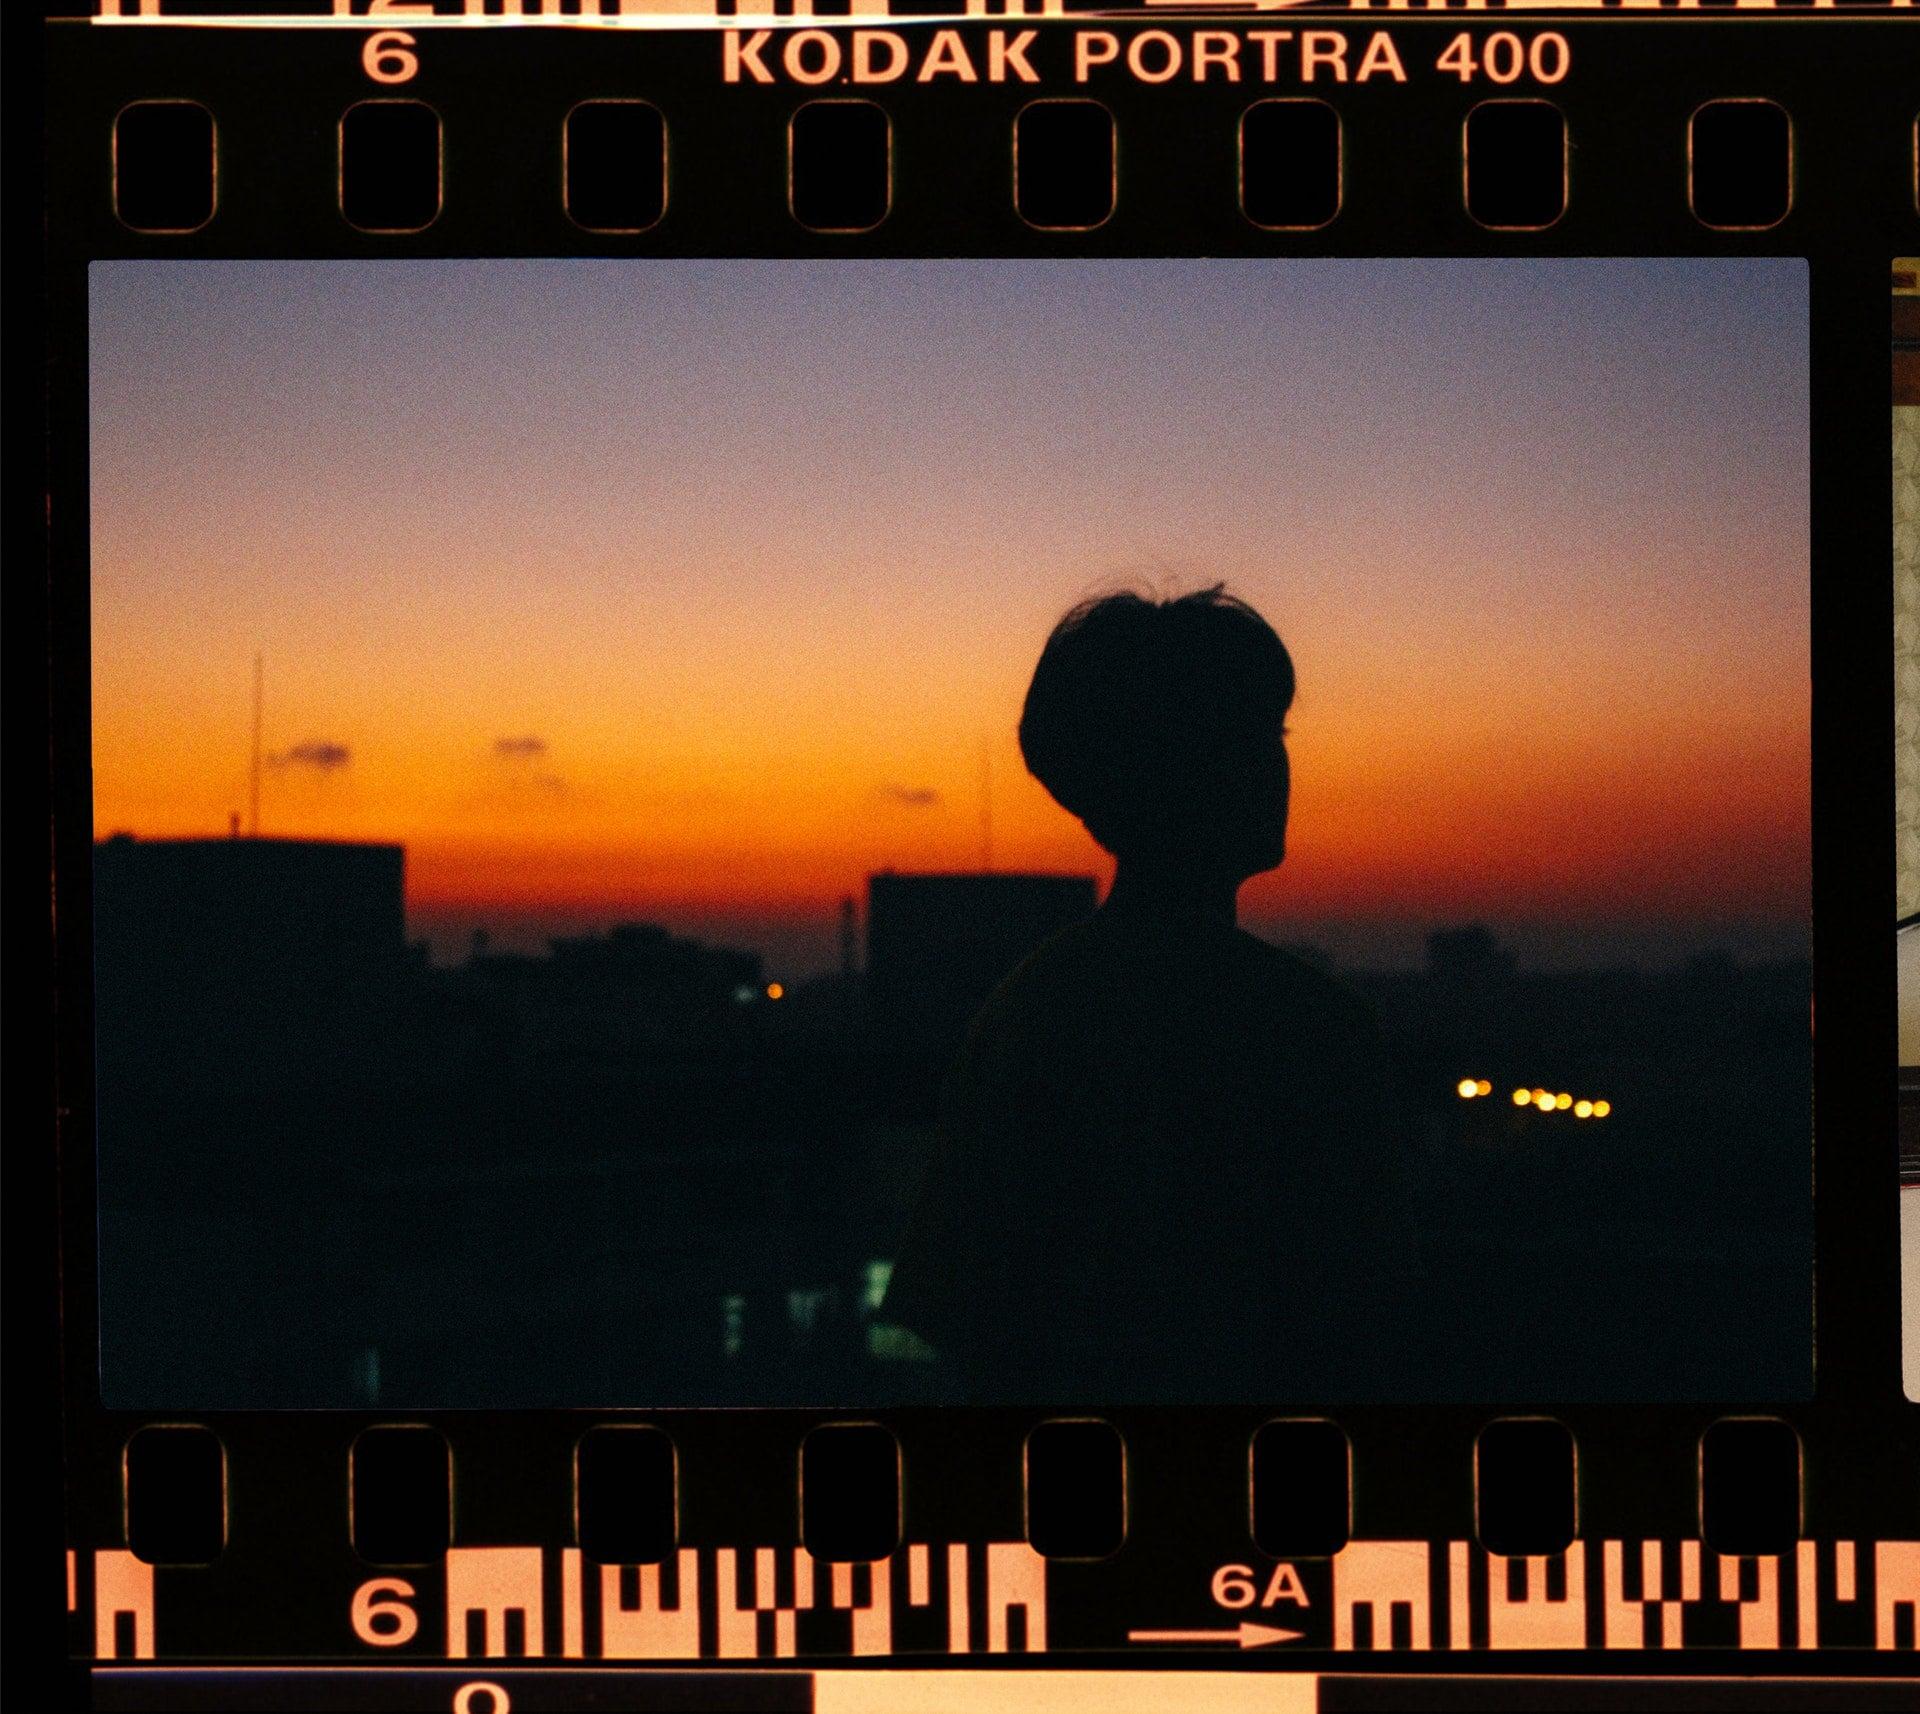 cinematography film negative Kodak Portra 400 ISO Sunset 旅行攝影 5+1 拍照技術教學 📷 記錄下精彩的旅途風景